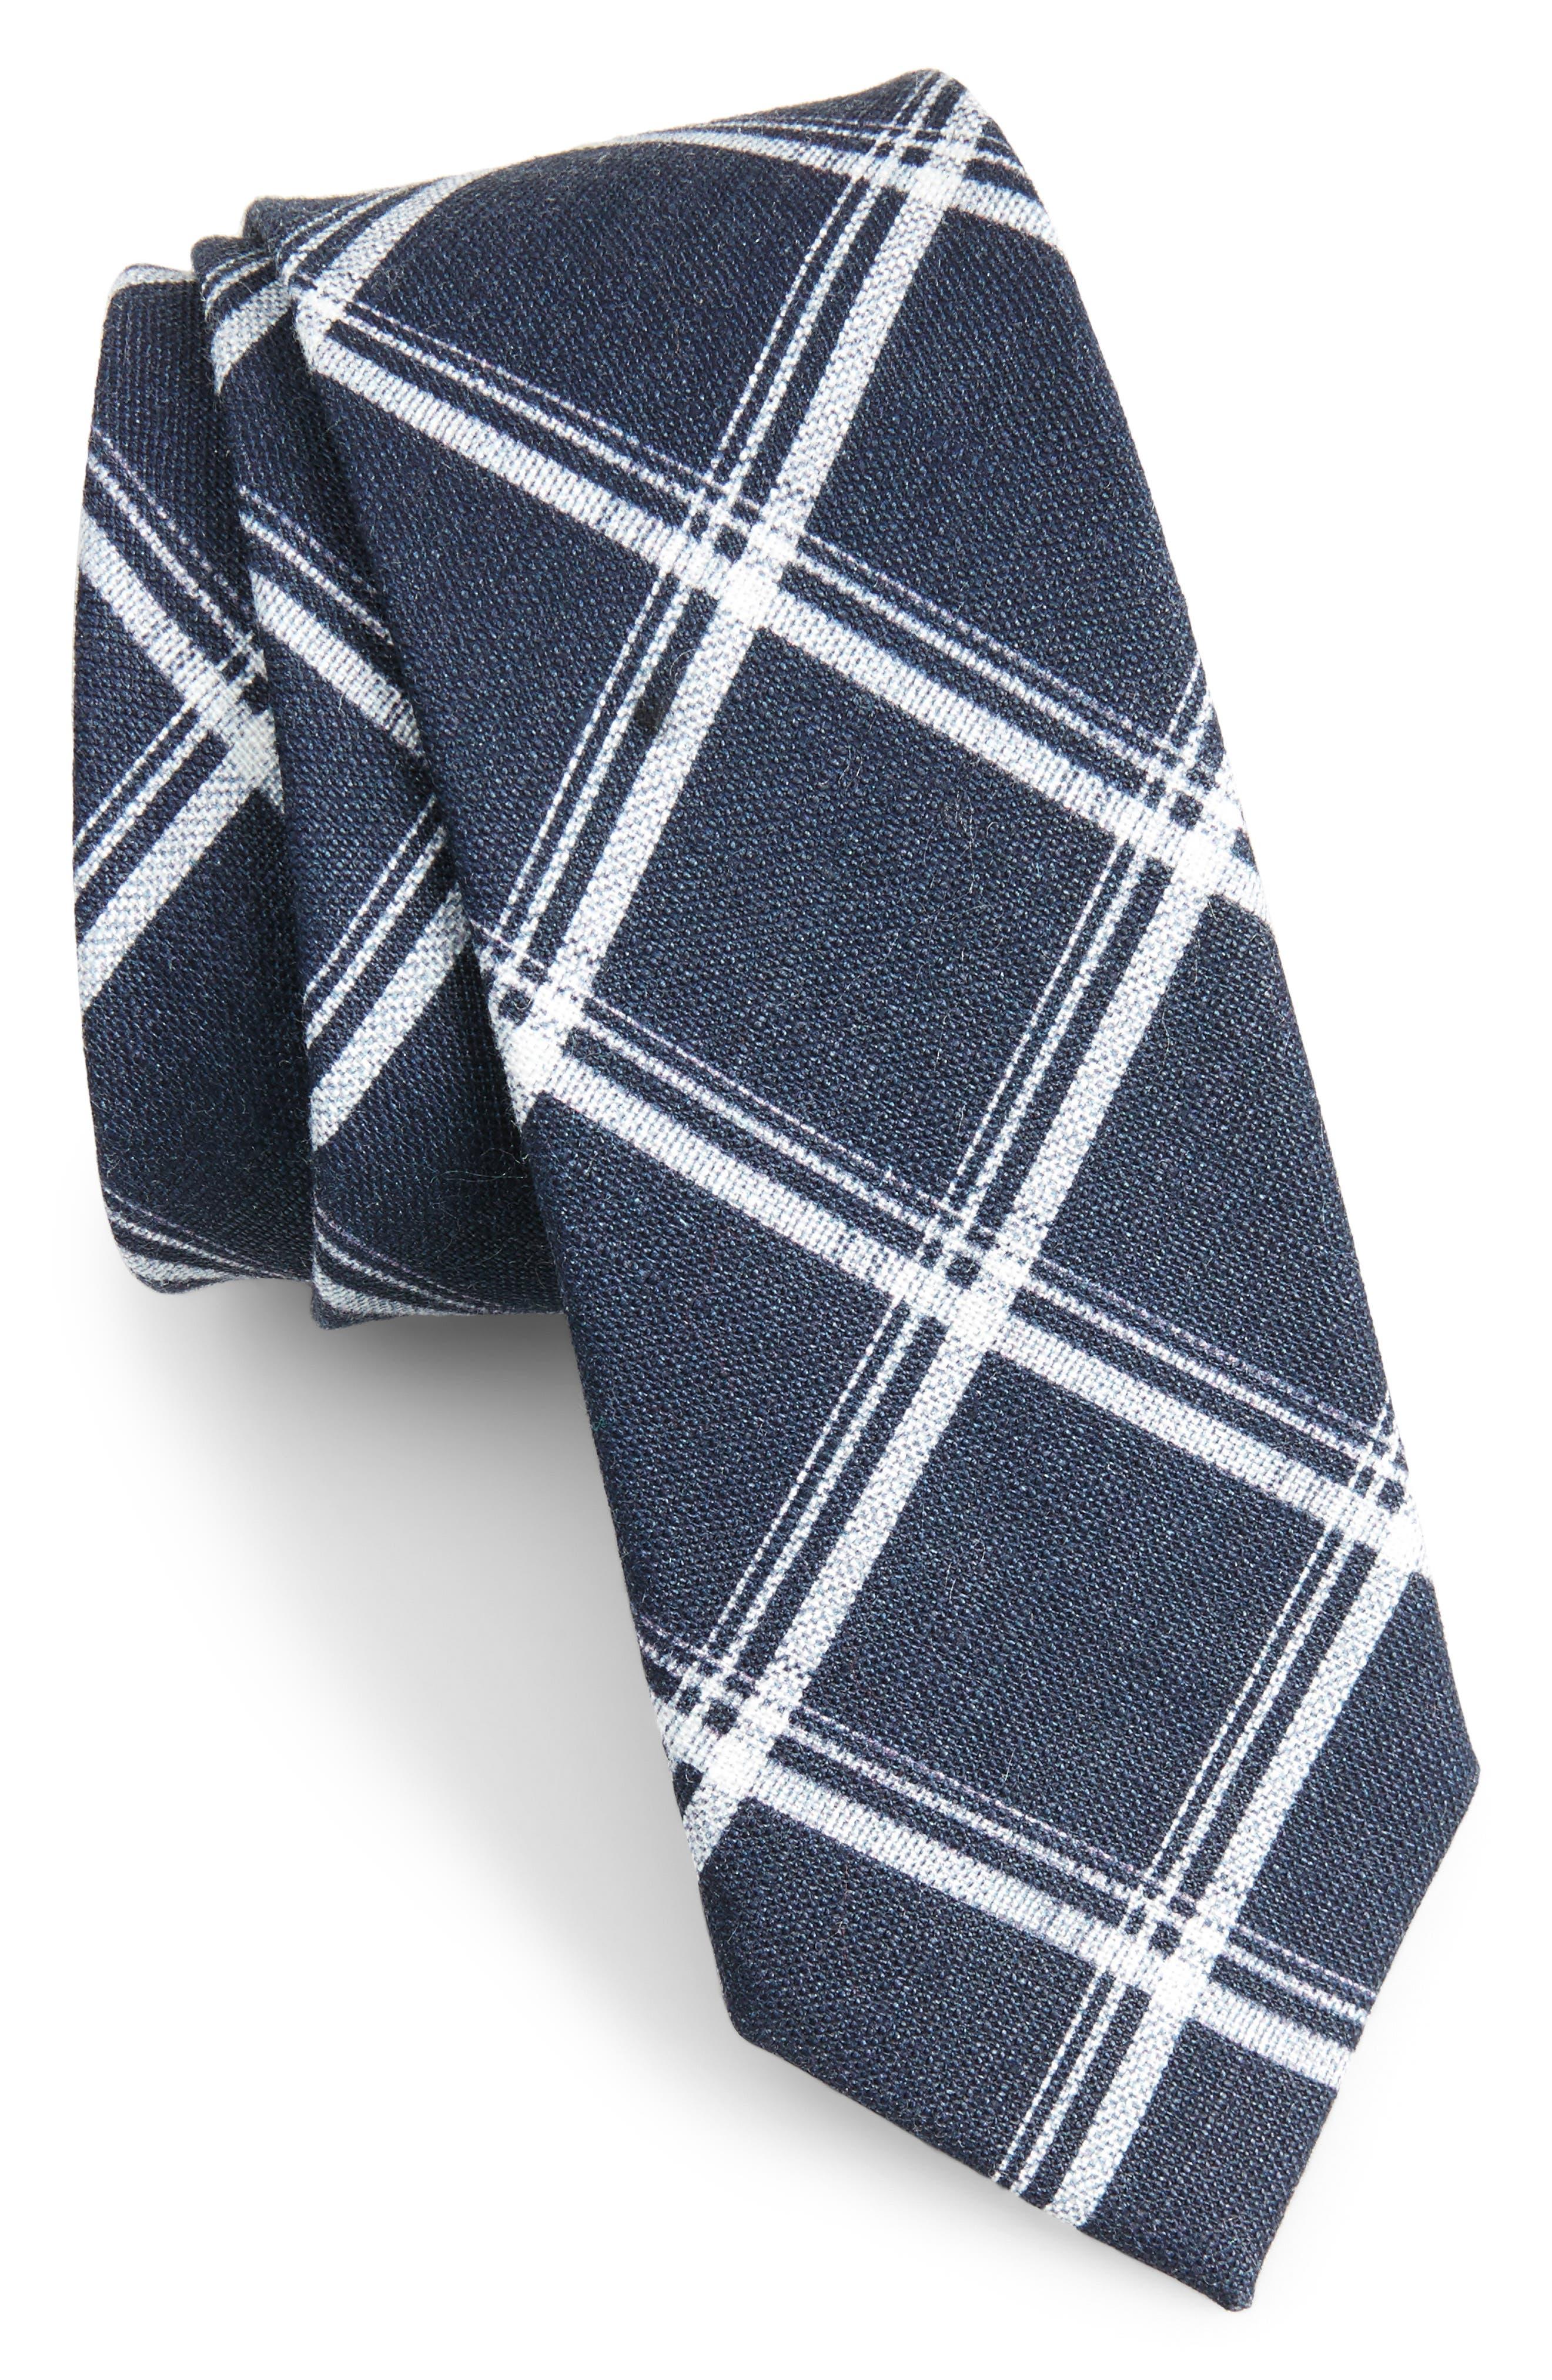 Jet Plaid Linen Skinny Tie,                             Main thumbnail 2, color,